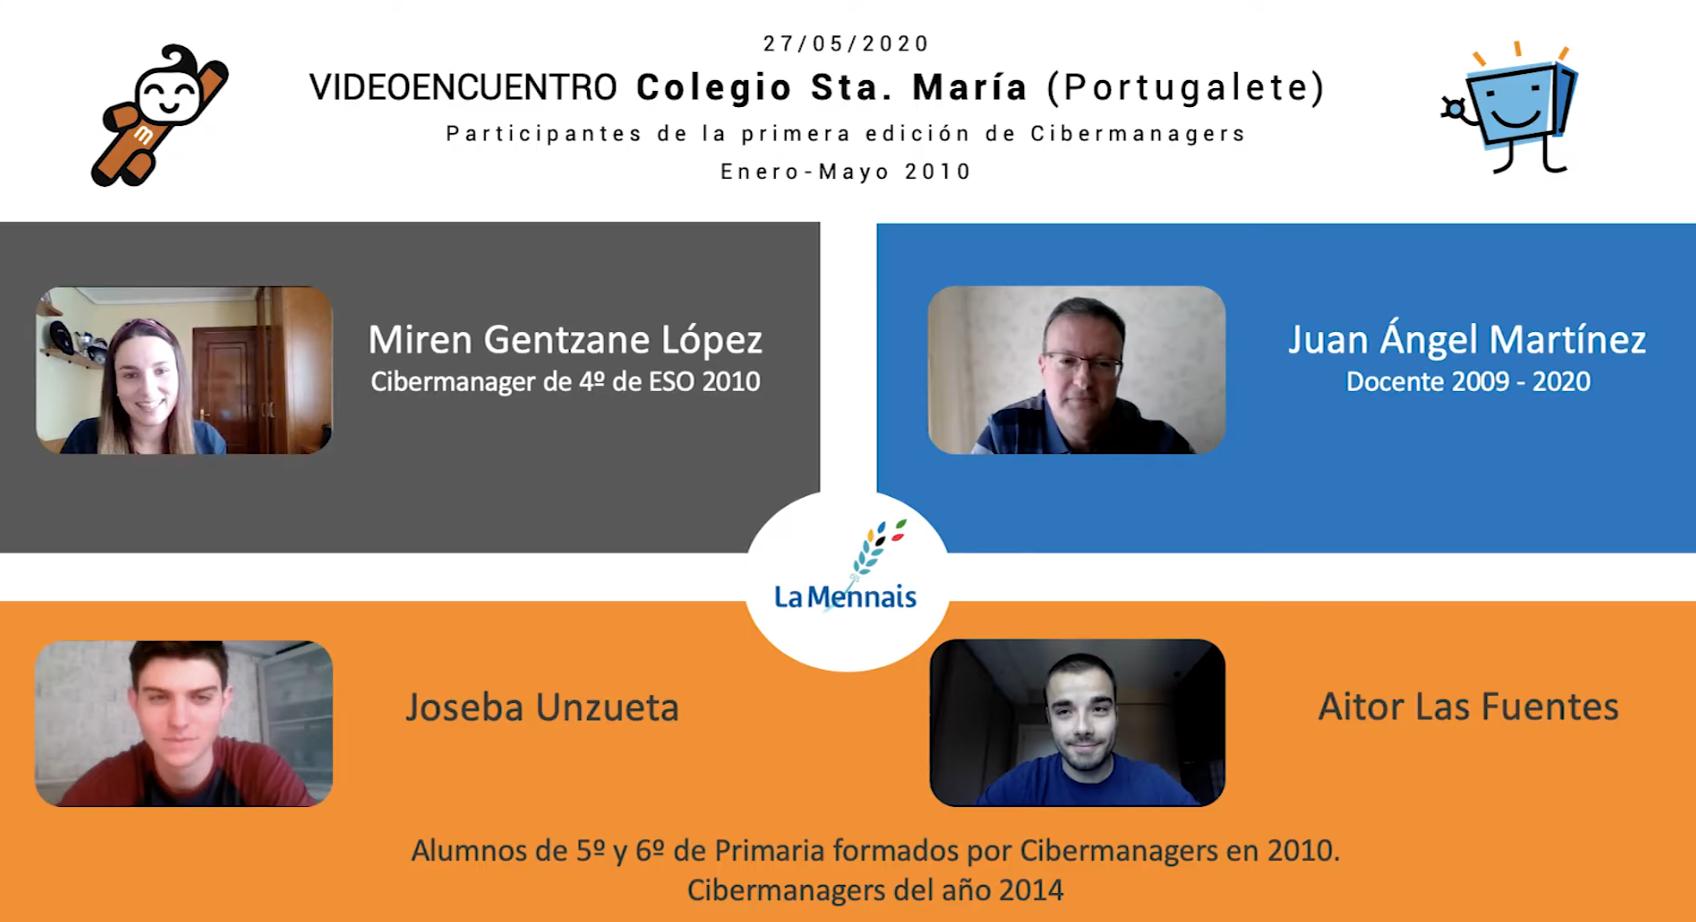 Reencuentro-de-Cibermanagers-del-Colegio-Santa-Maria